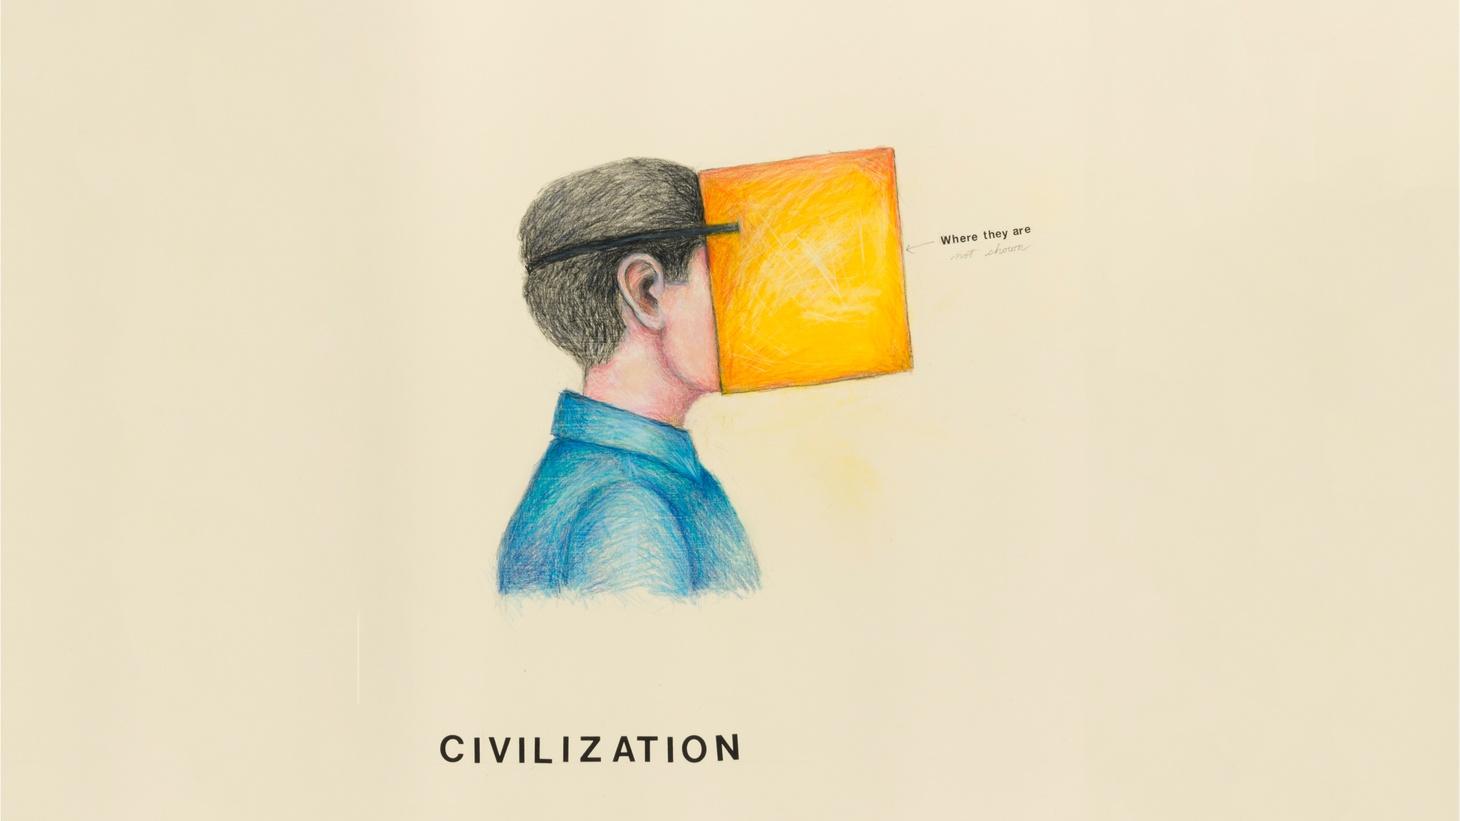 Civilization (MemWars), 2018 - 2019  mixed media on paper  30 x 22 in.  (76.2 x 55.9 cm)  © Terry Allen.